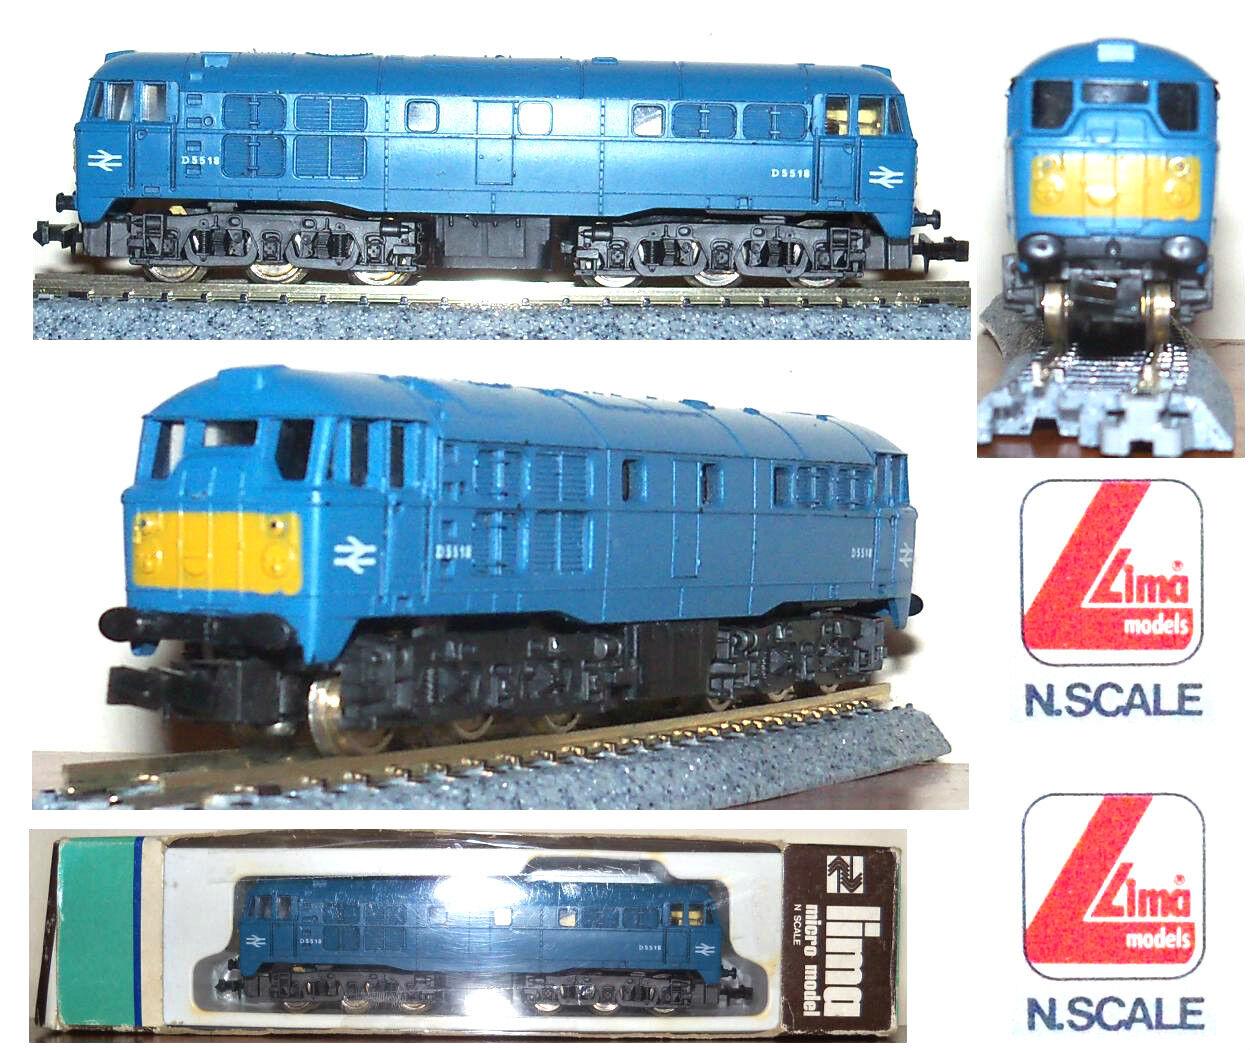 LIMA 209 LOCOMOTORE DIESEL CARGO D5518 LUNGO 6 ASSI BRITISH RAILWAYS BOX SCALA-N